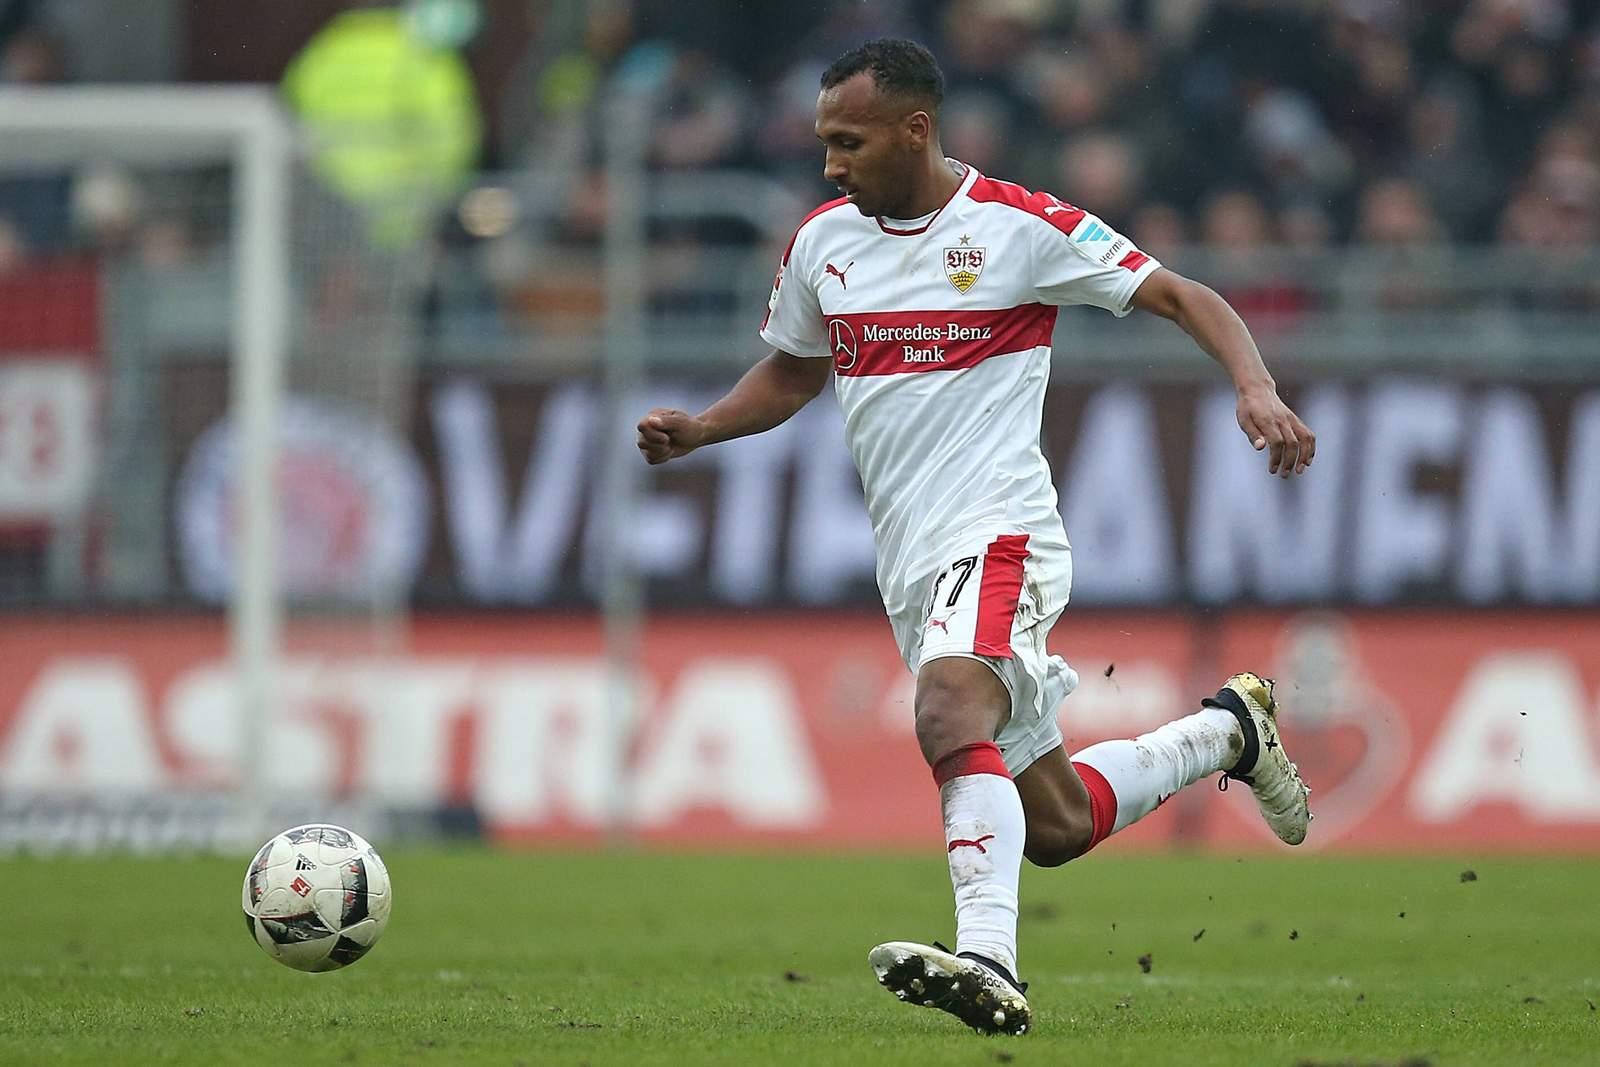 Julian Green vom VfB Stuttgart